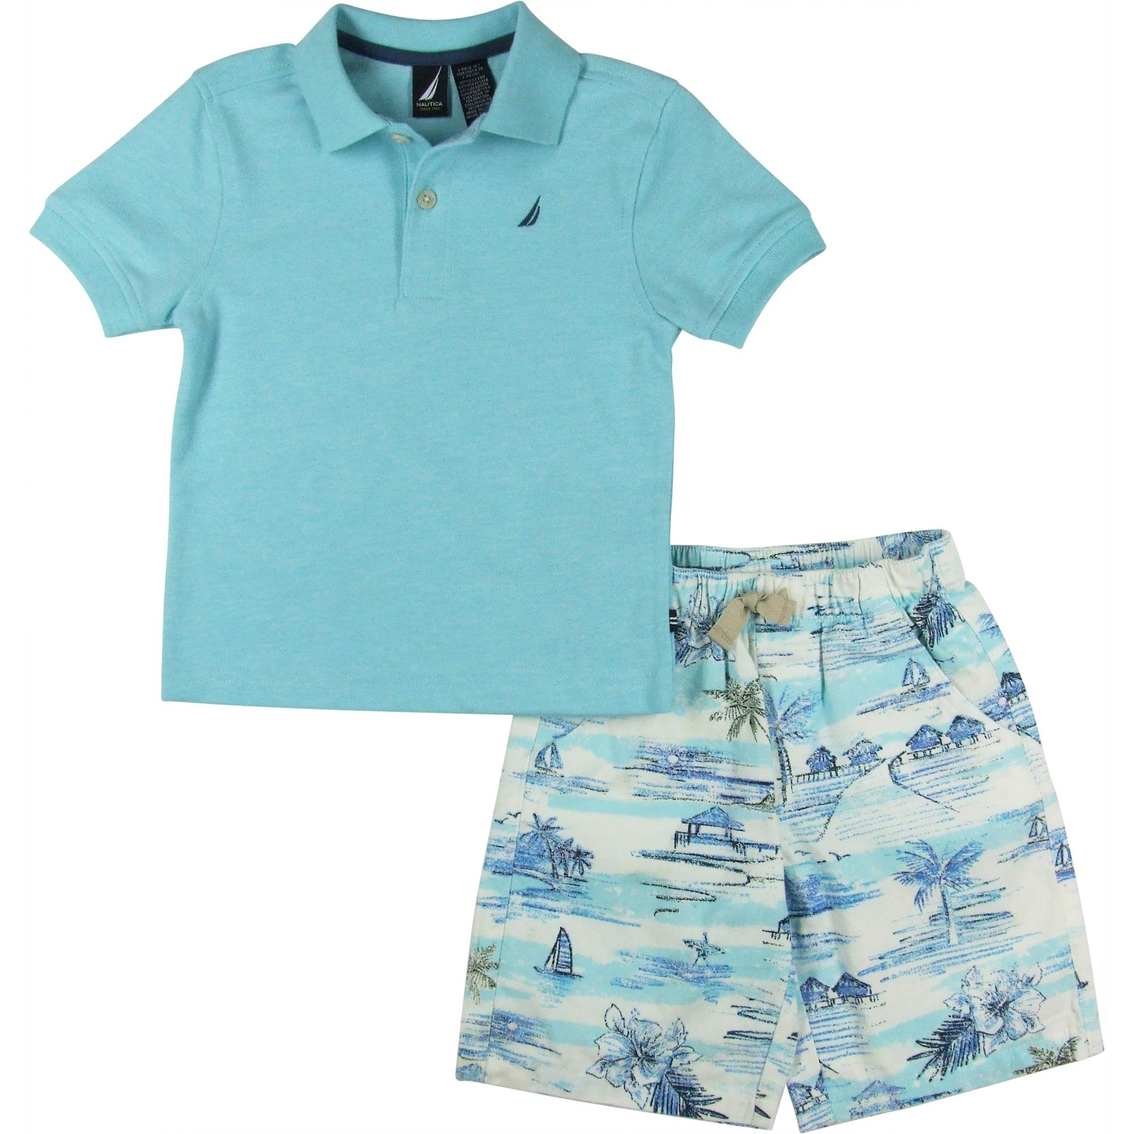 2f0c4aac4 Nautica Toddler Boy 2 Pc. Short Sleeve Woven Short Set